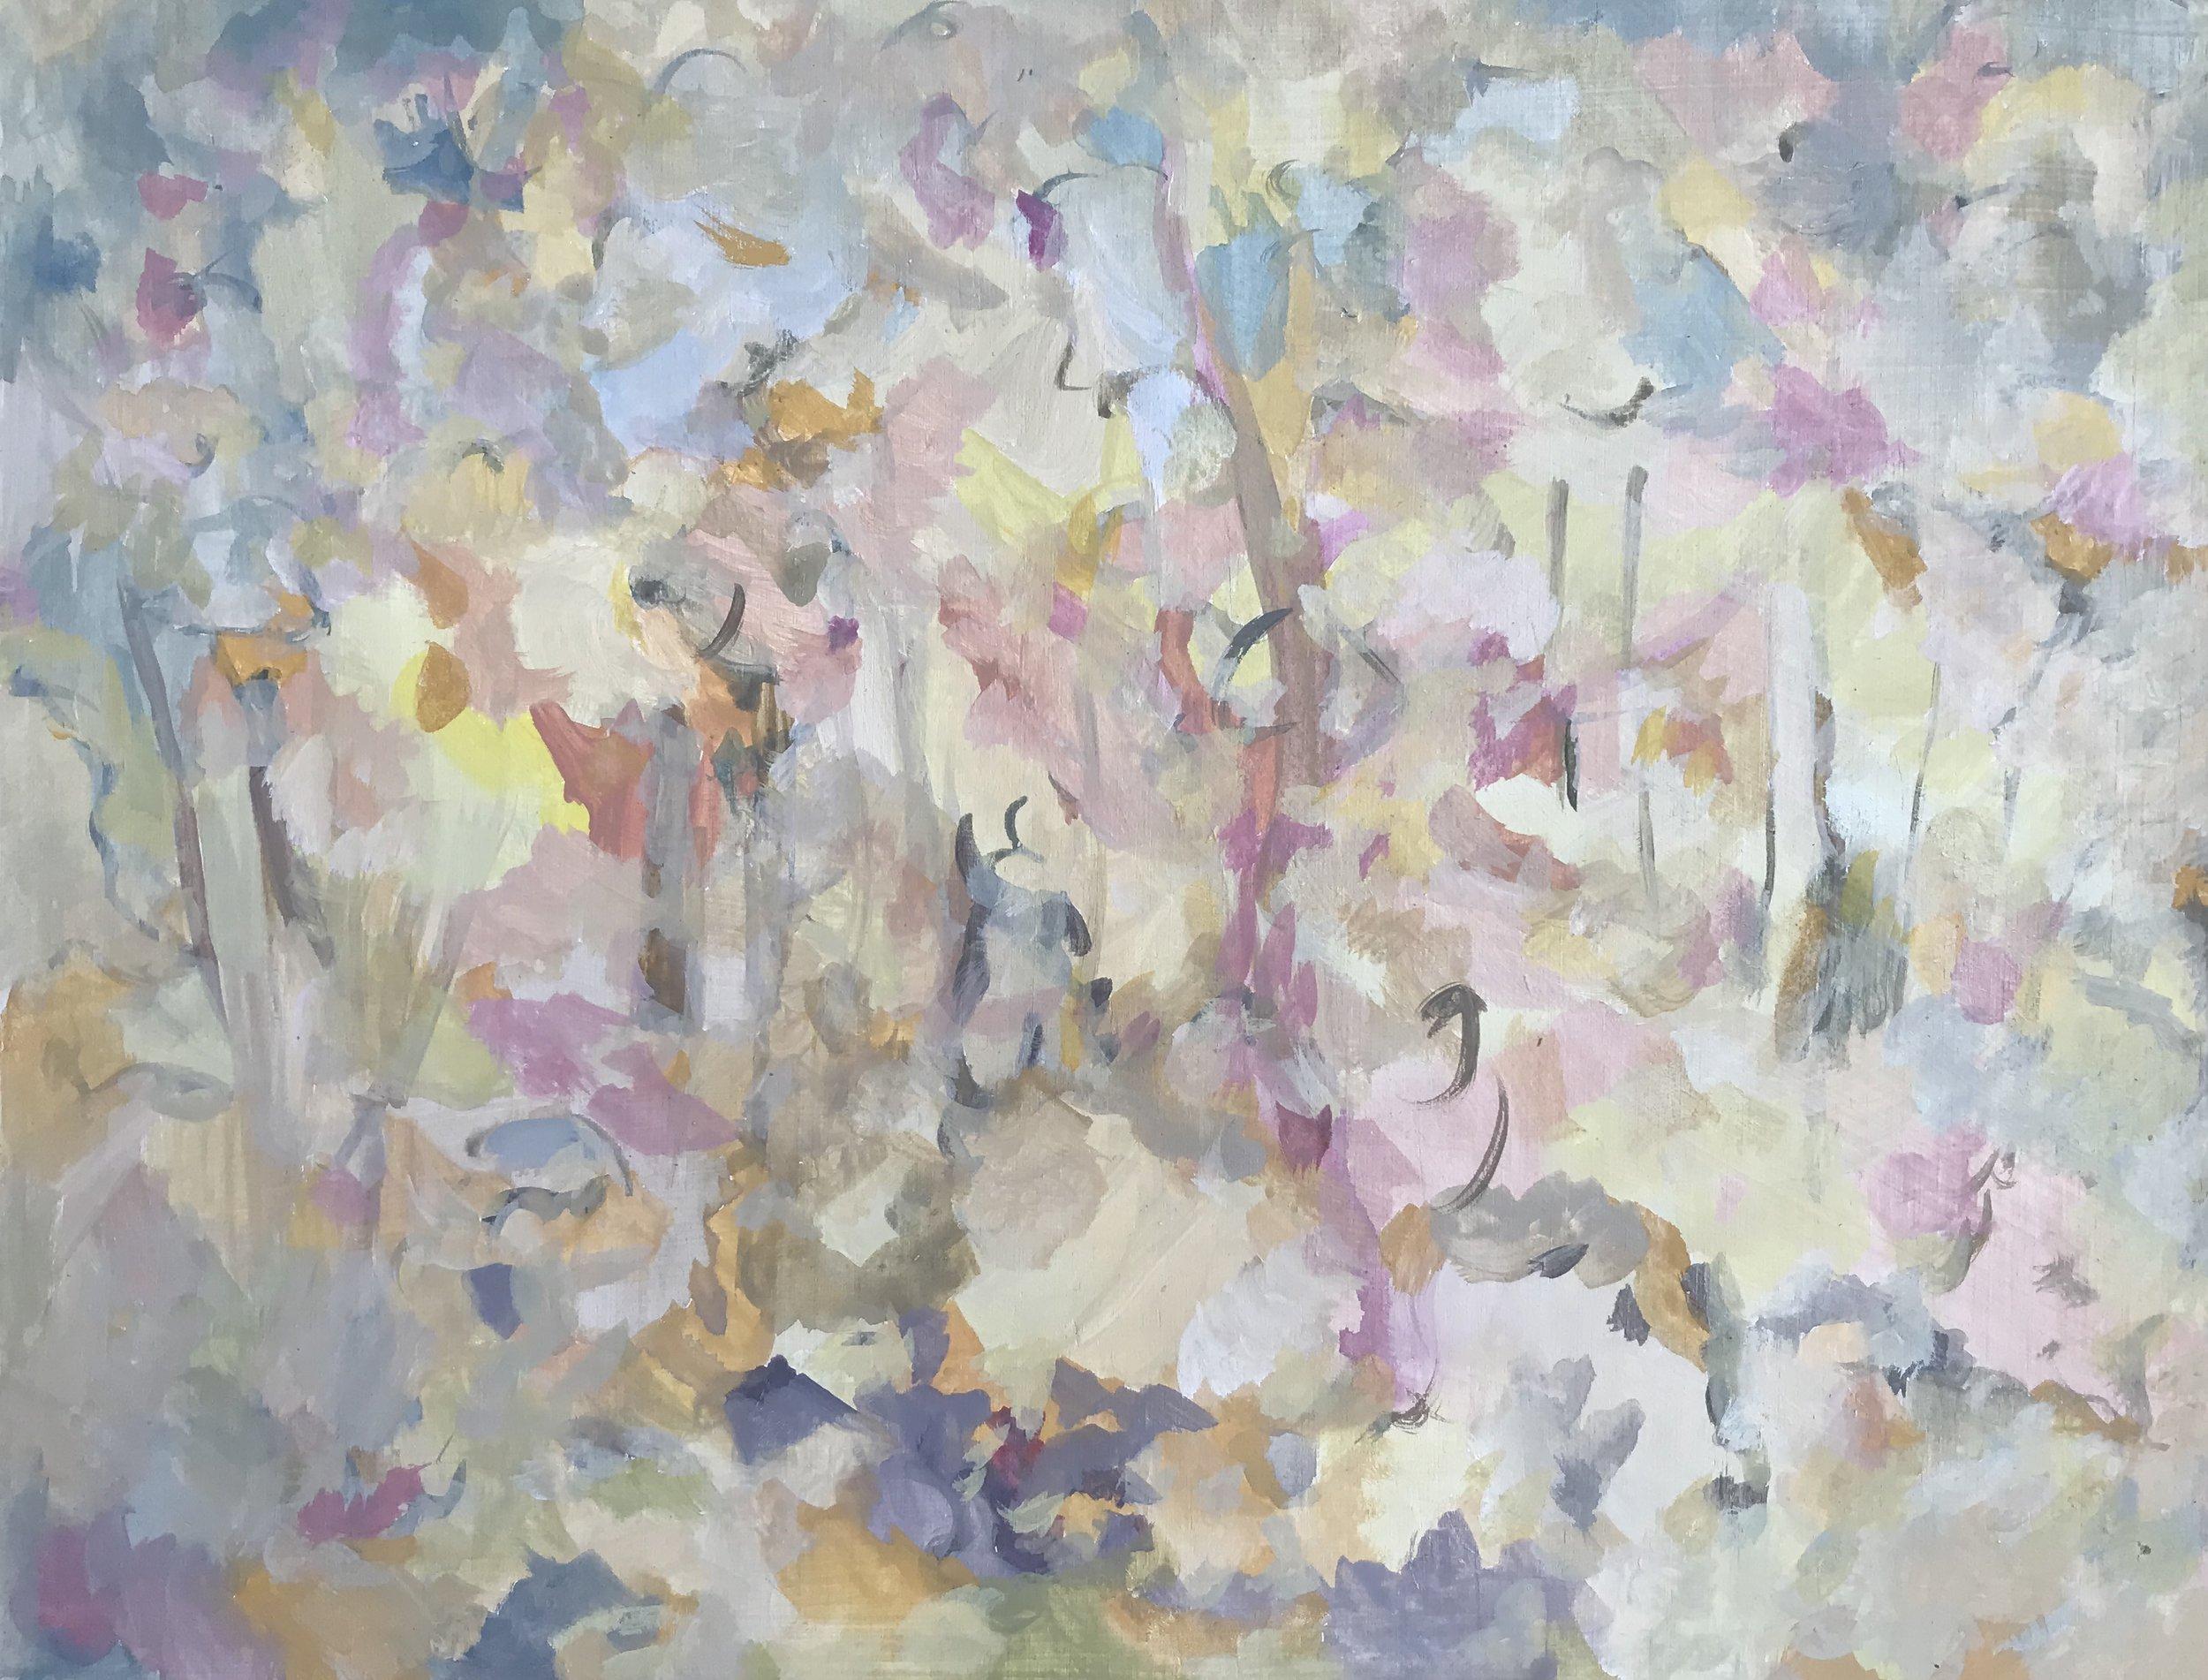 'Summer 1'_30 x 40cm_2018_Lorna Grear_ Courtesy of the artist.